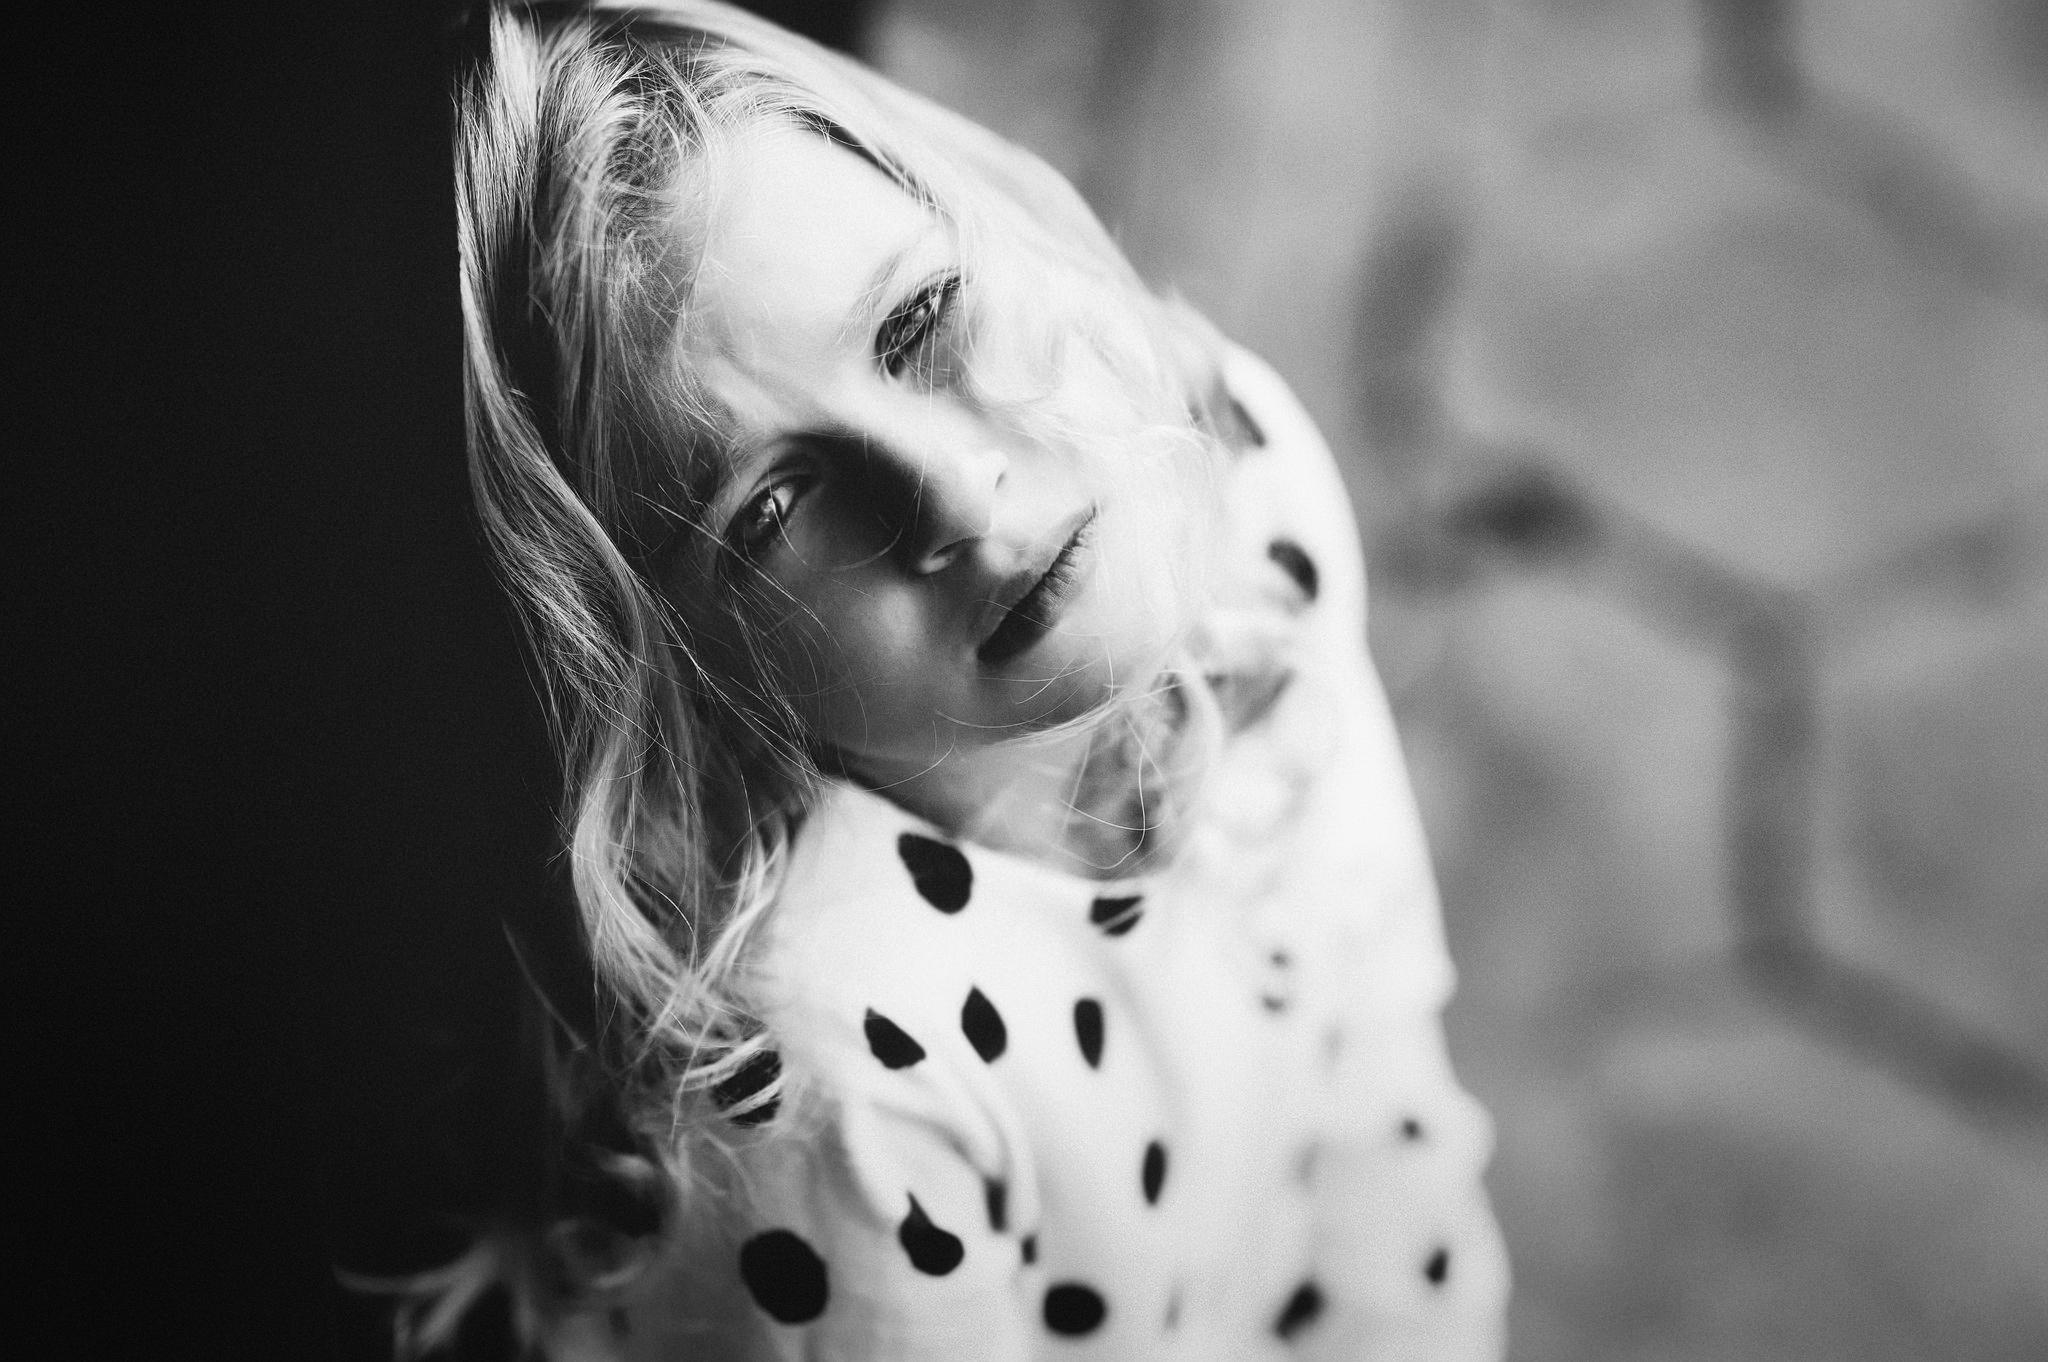 Model Depth Of Field Portrait Blonde Looking At Viewer Photography Children Monochrome 2048x1362